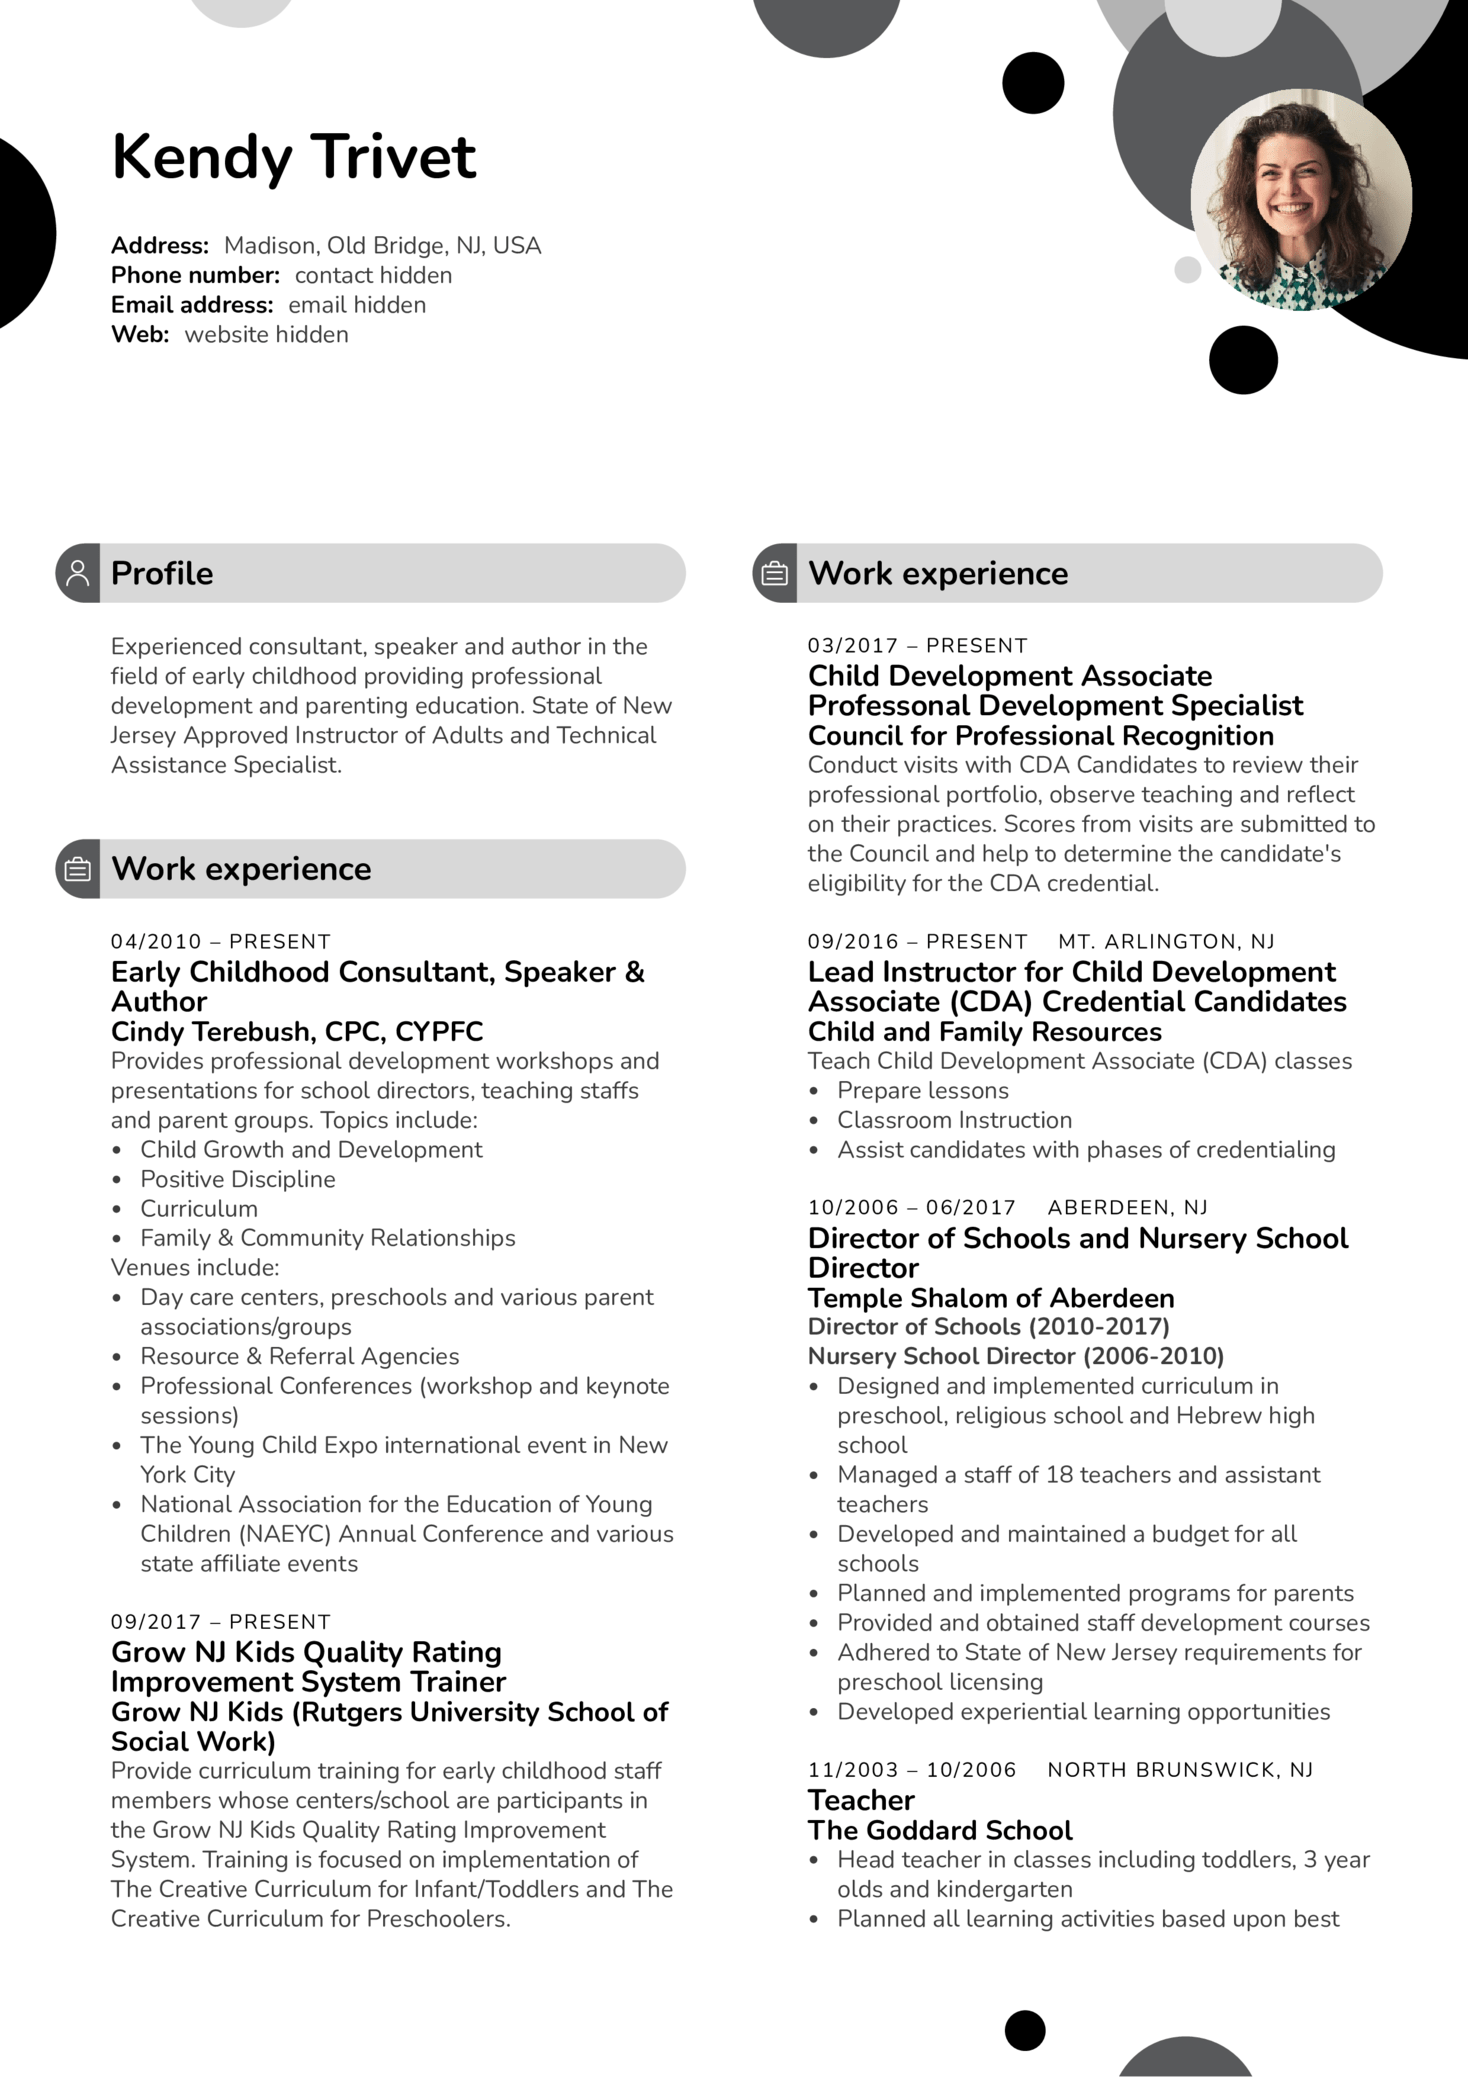 Rutgers University Child Development Associate Resume Sample (Part 1)